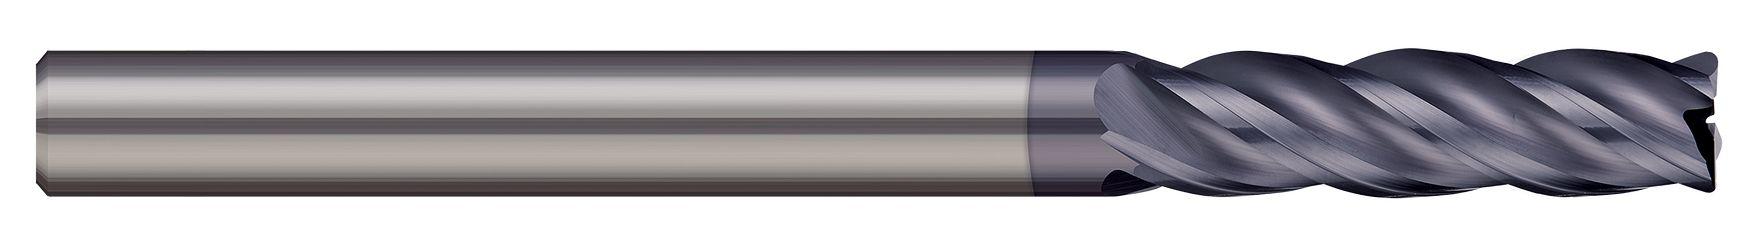 tool-details-VLM-250-4X